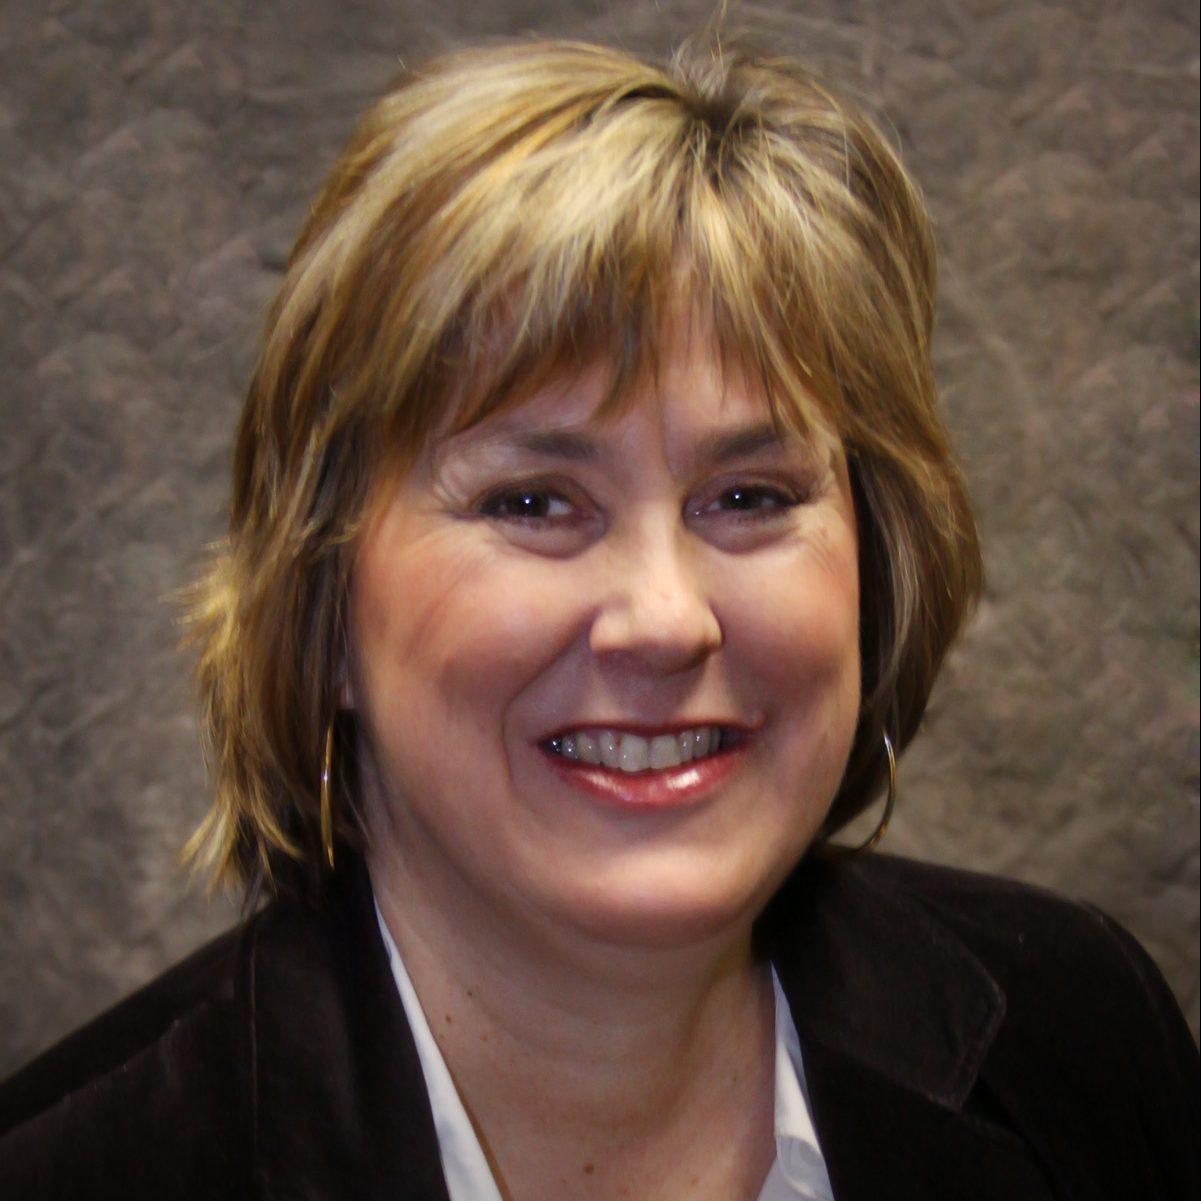 headshot of Linda Johnson